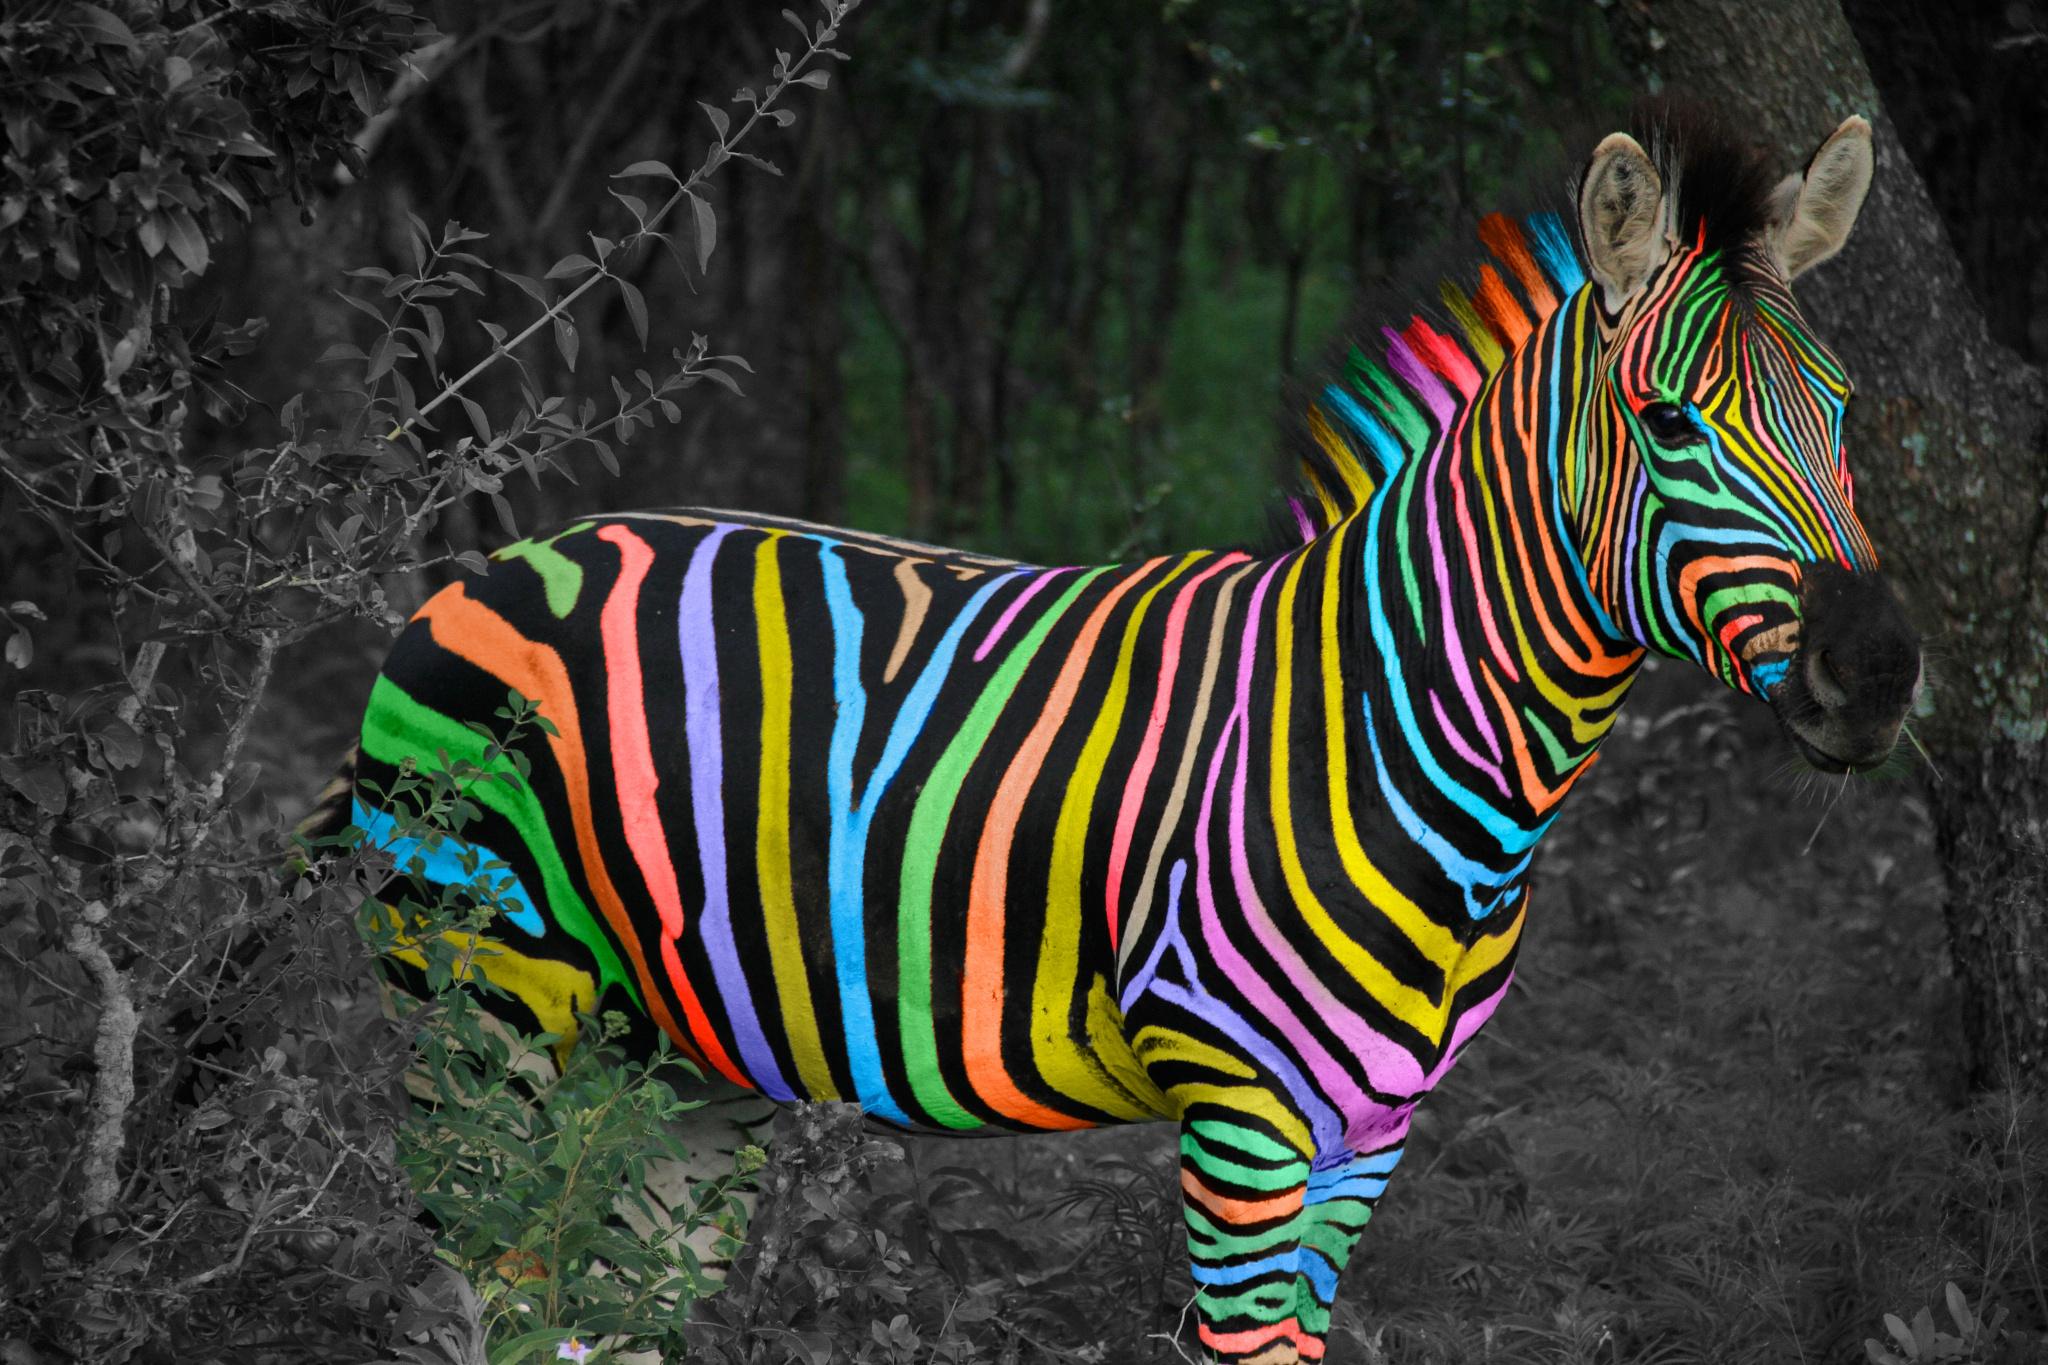 Colourful Zebra by James Blyth Currie